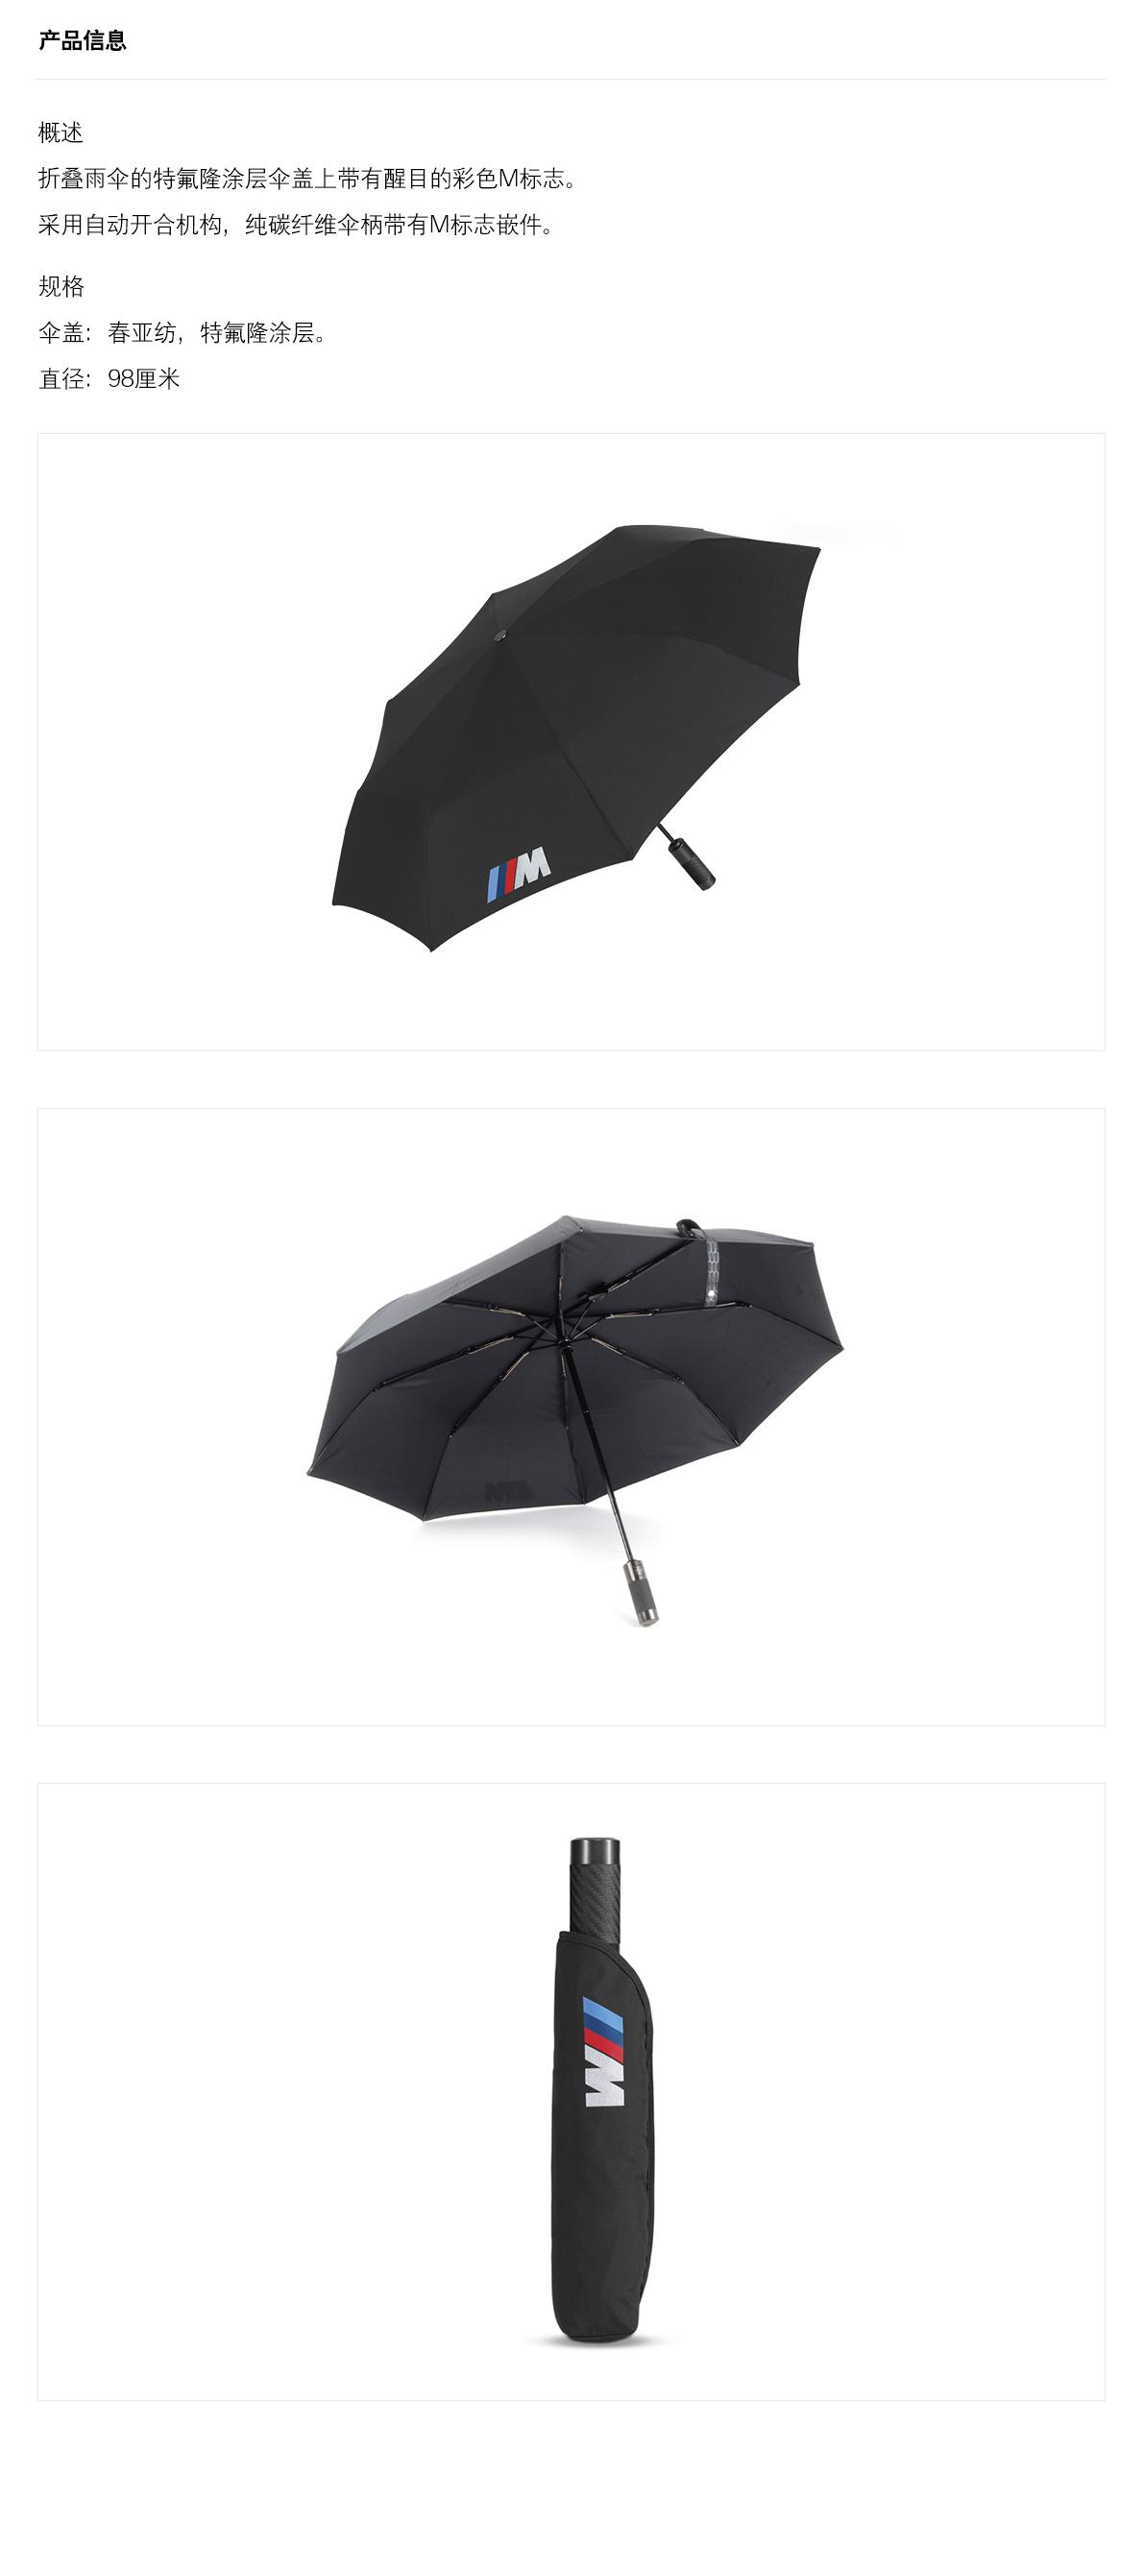 BMW M 袖珍雨伞 黑色 自动开合